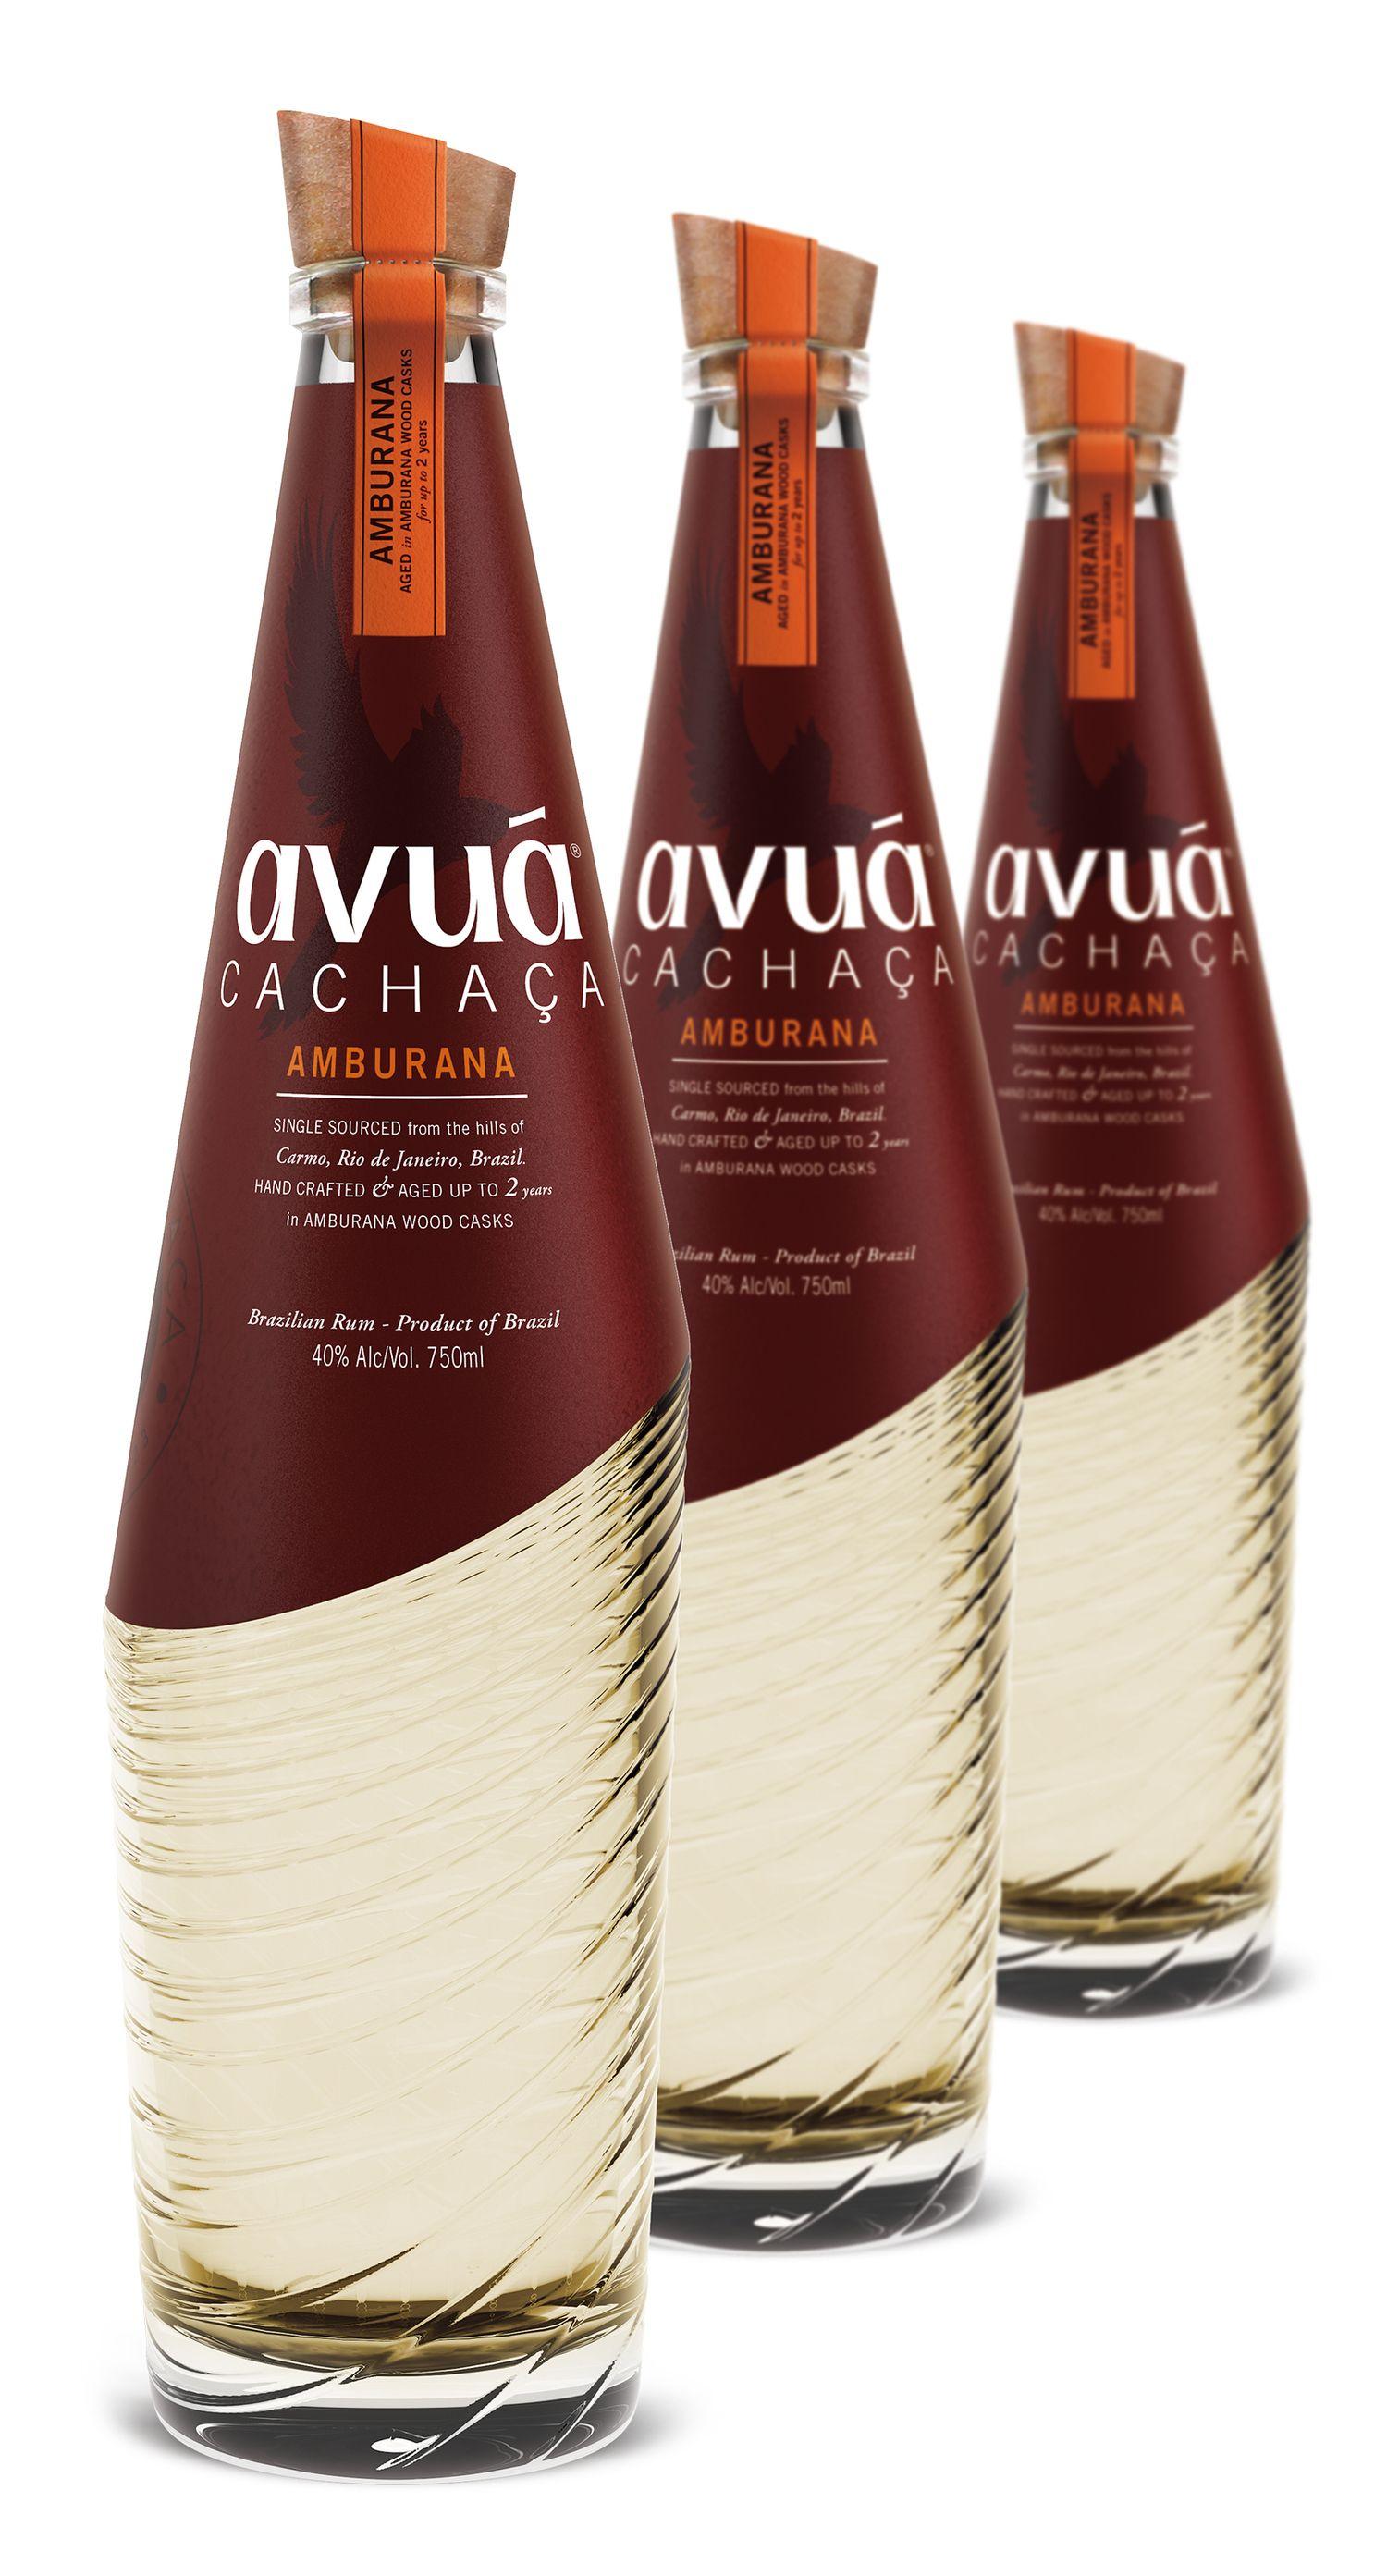 Discover Amburana Avua Cachaca Cachaca Cachaca Cocktails Wine Bottle